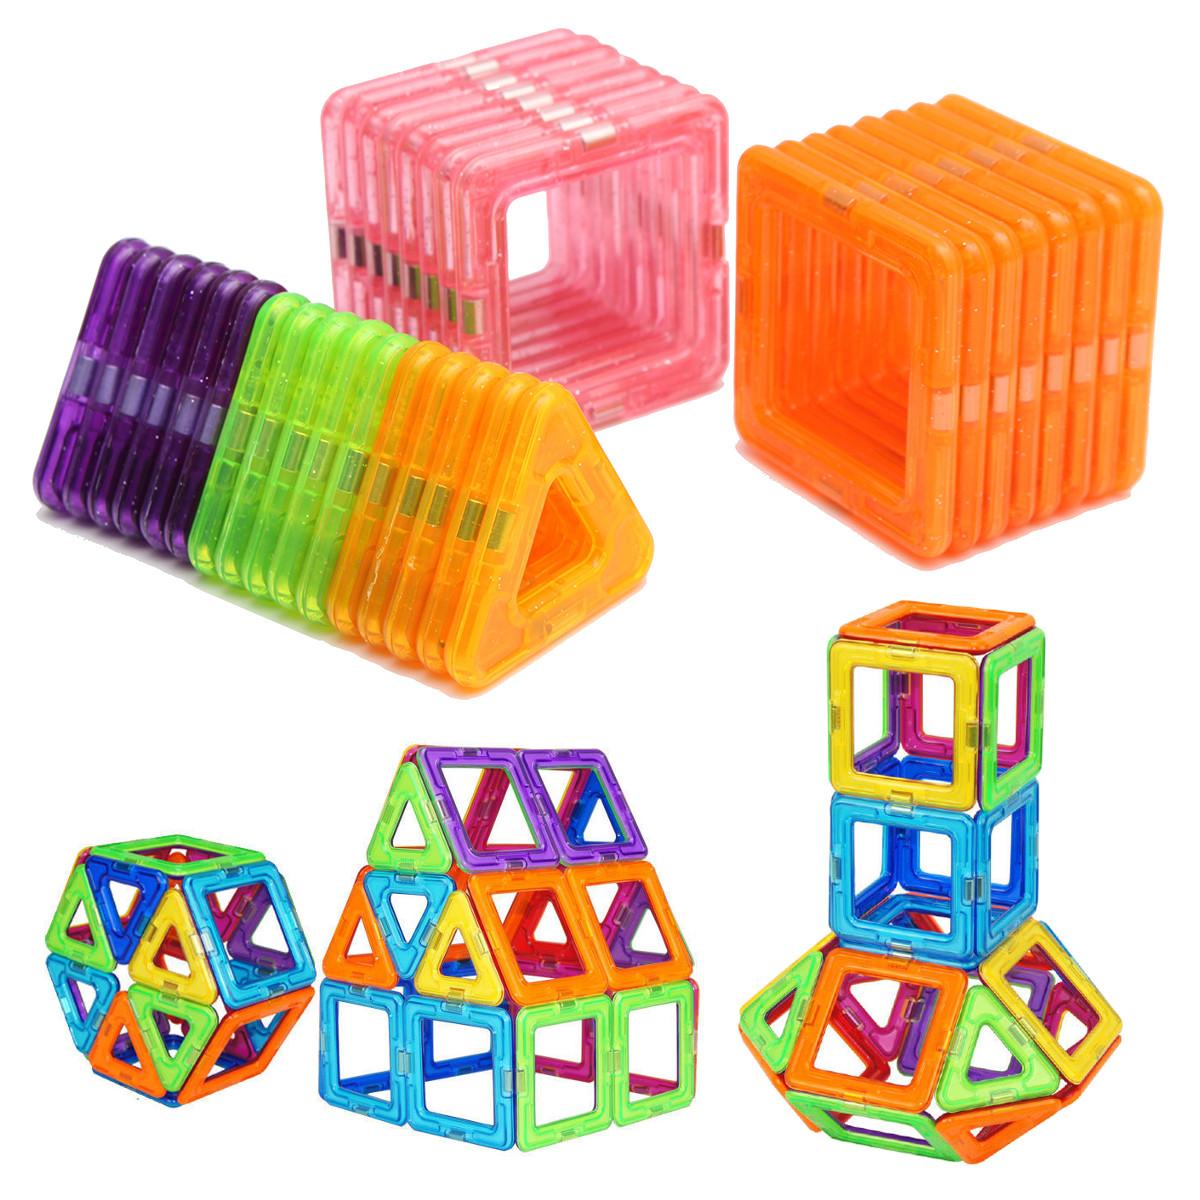 Meigar 32 Pcs Mini Magnetic Bricks Building Blocks Tiles Educational Building Construction Toy Set Kids Children Birthday Christmas Gift ,Multi Colors